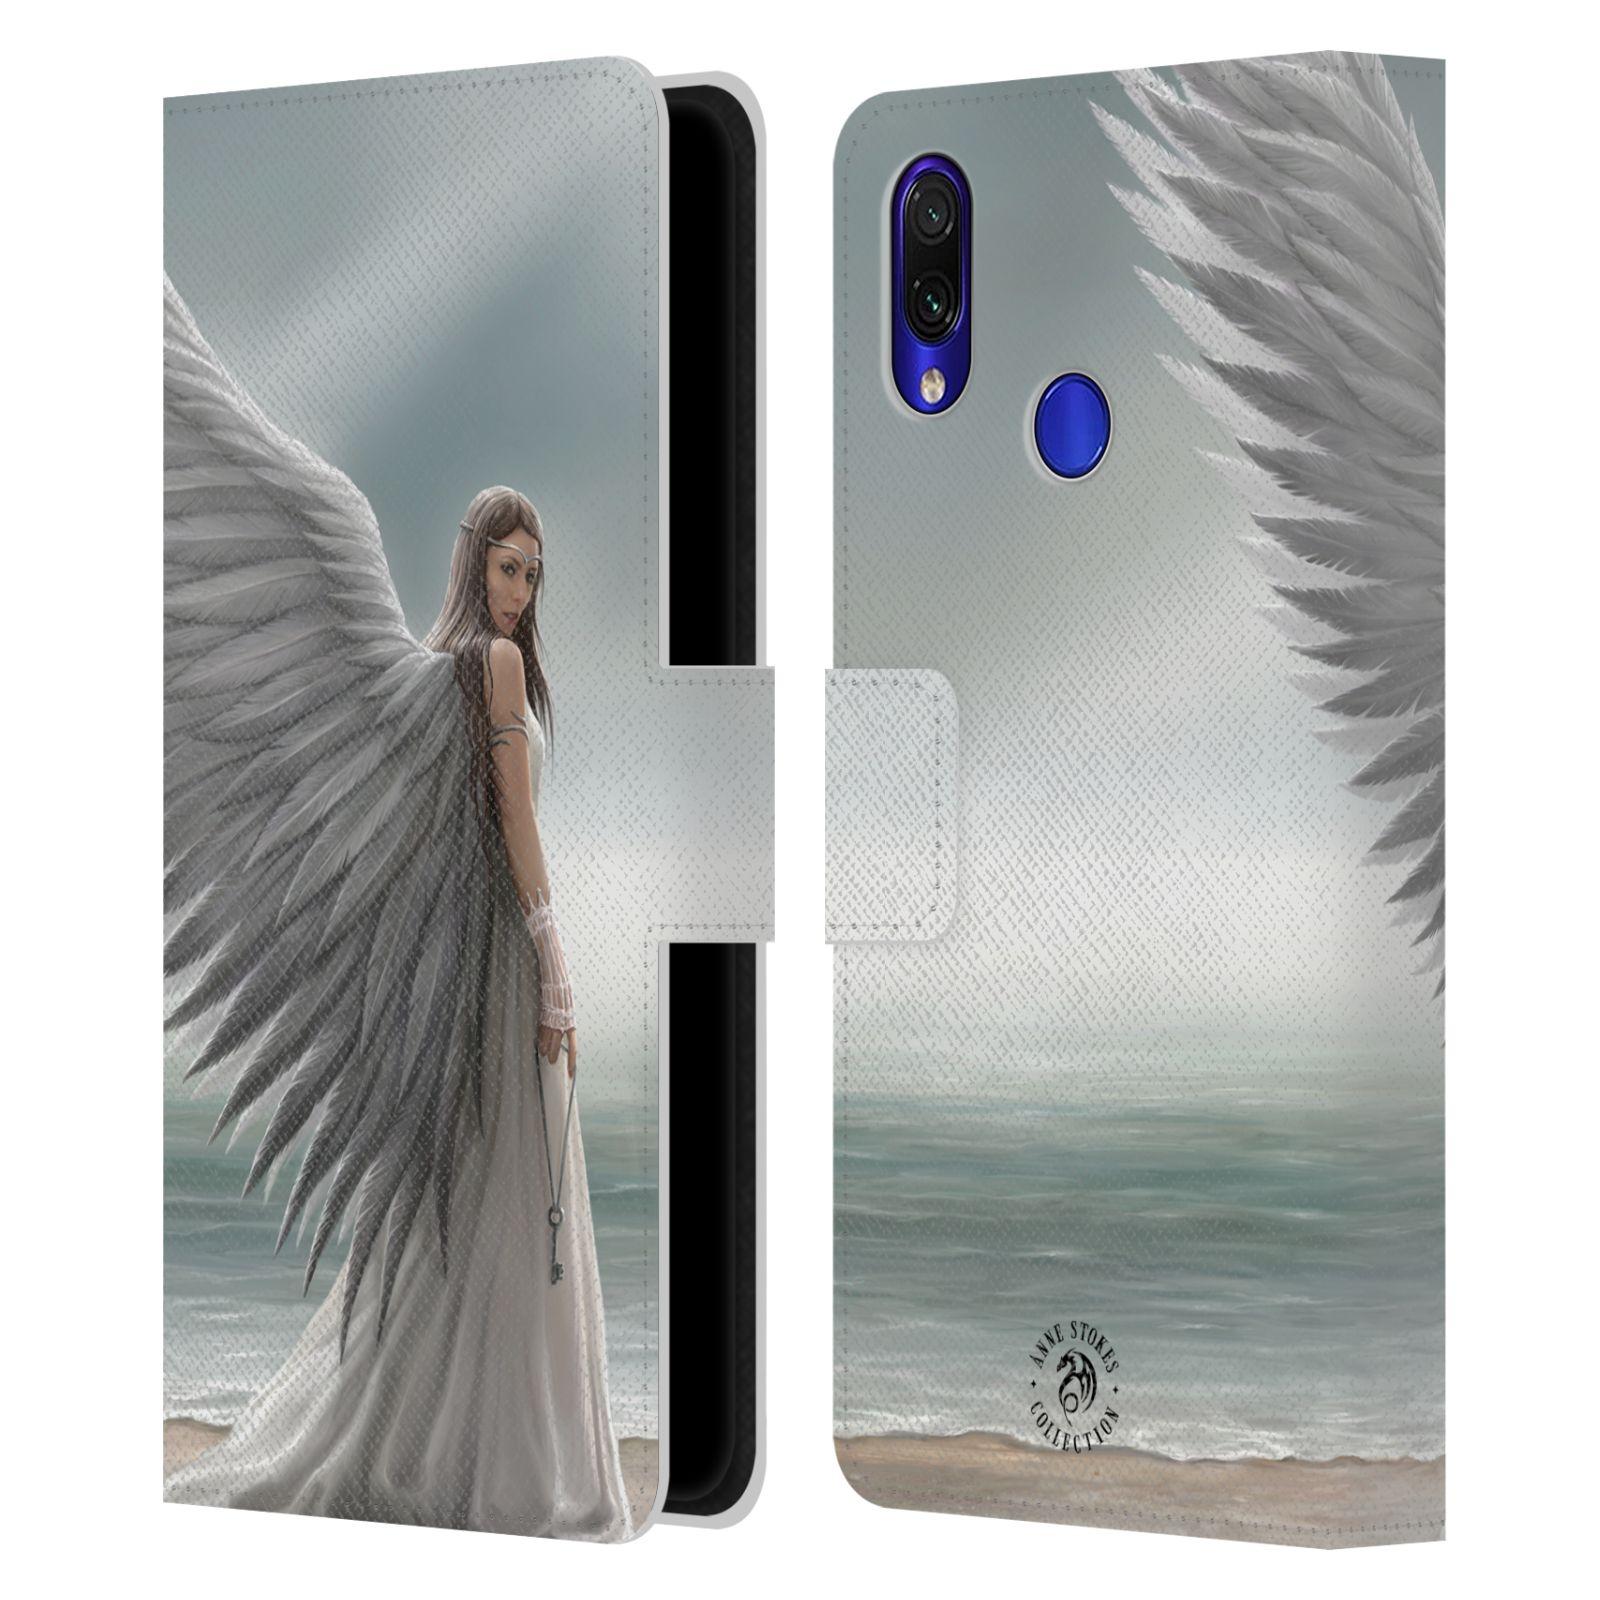 Pouzdro na mobil Xiaomi Redmi Note 7 / Note 7 PRO - Head Case - fantasy - anděl na pláži